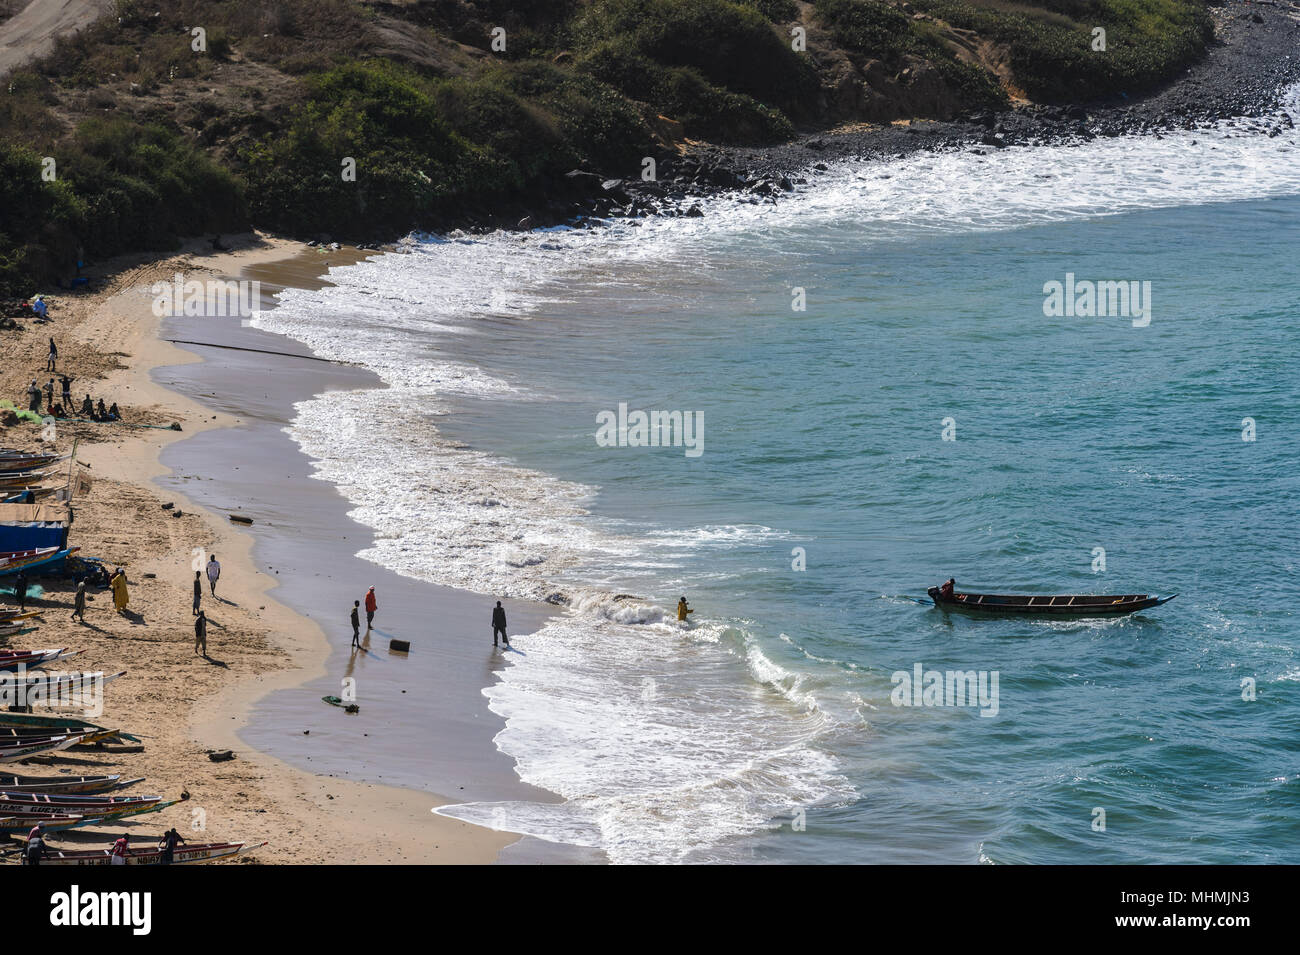 Coast of Dakar, the capital and largest city of Senegal. Stock Photo